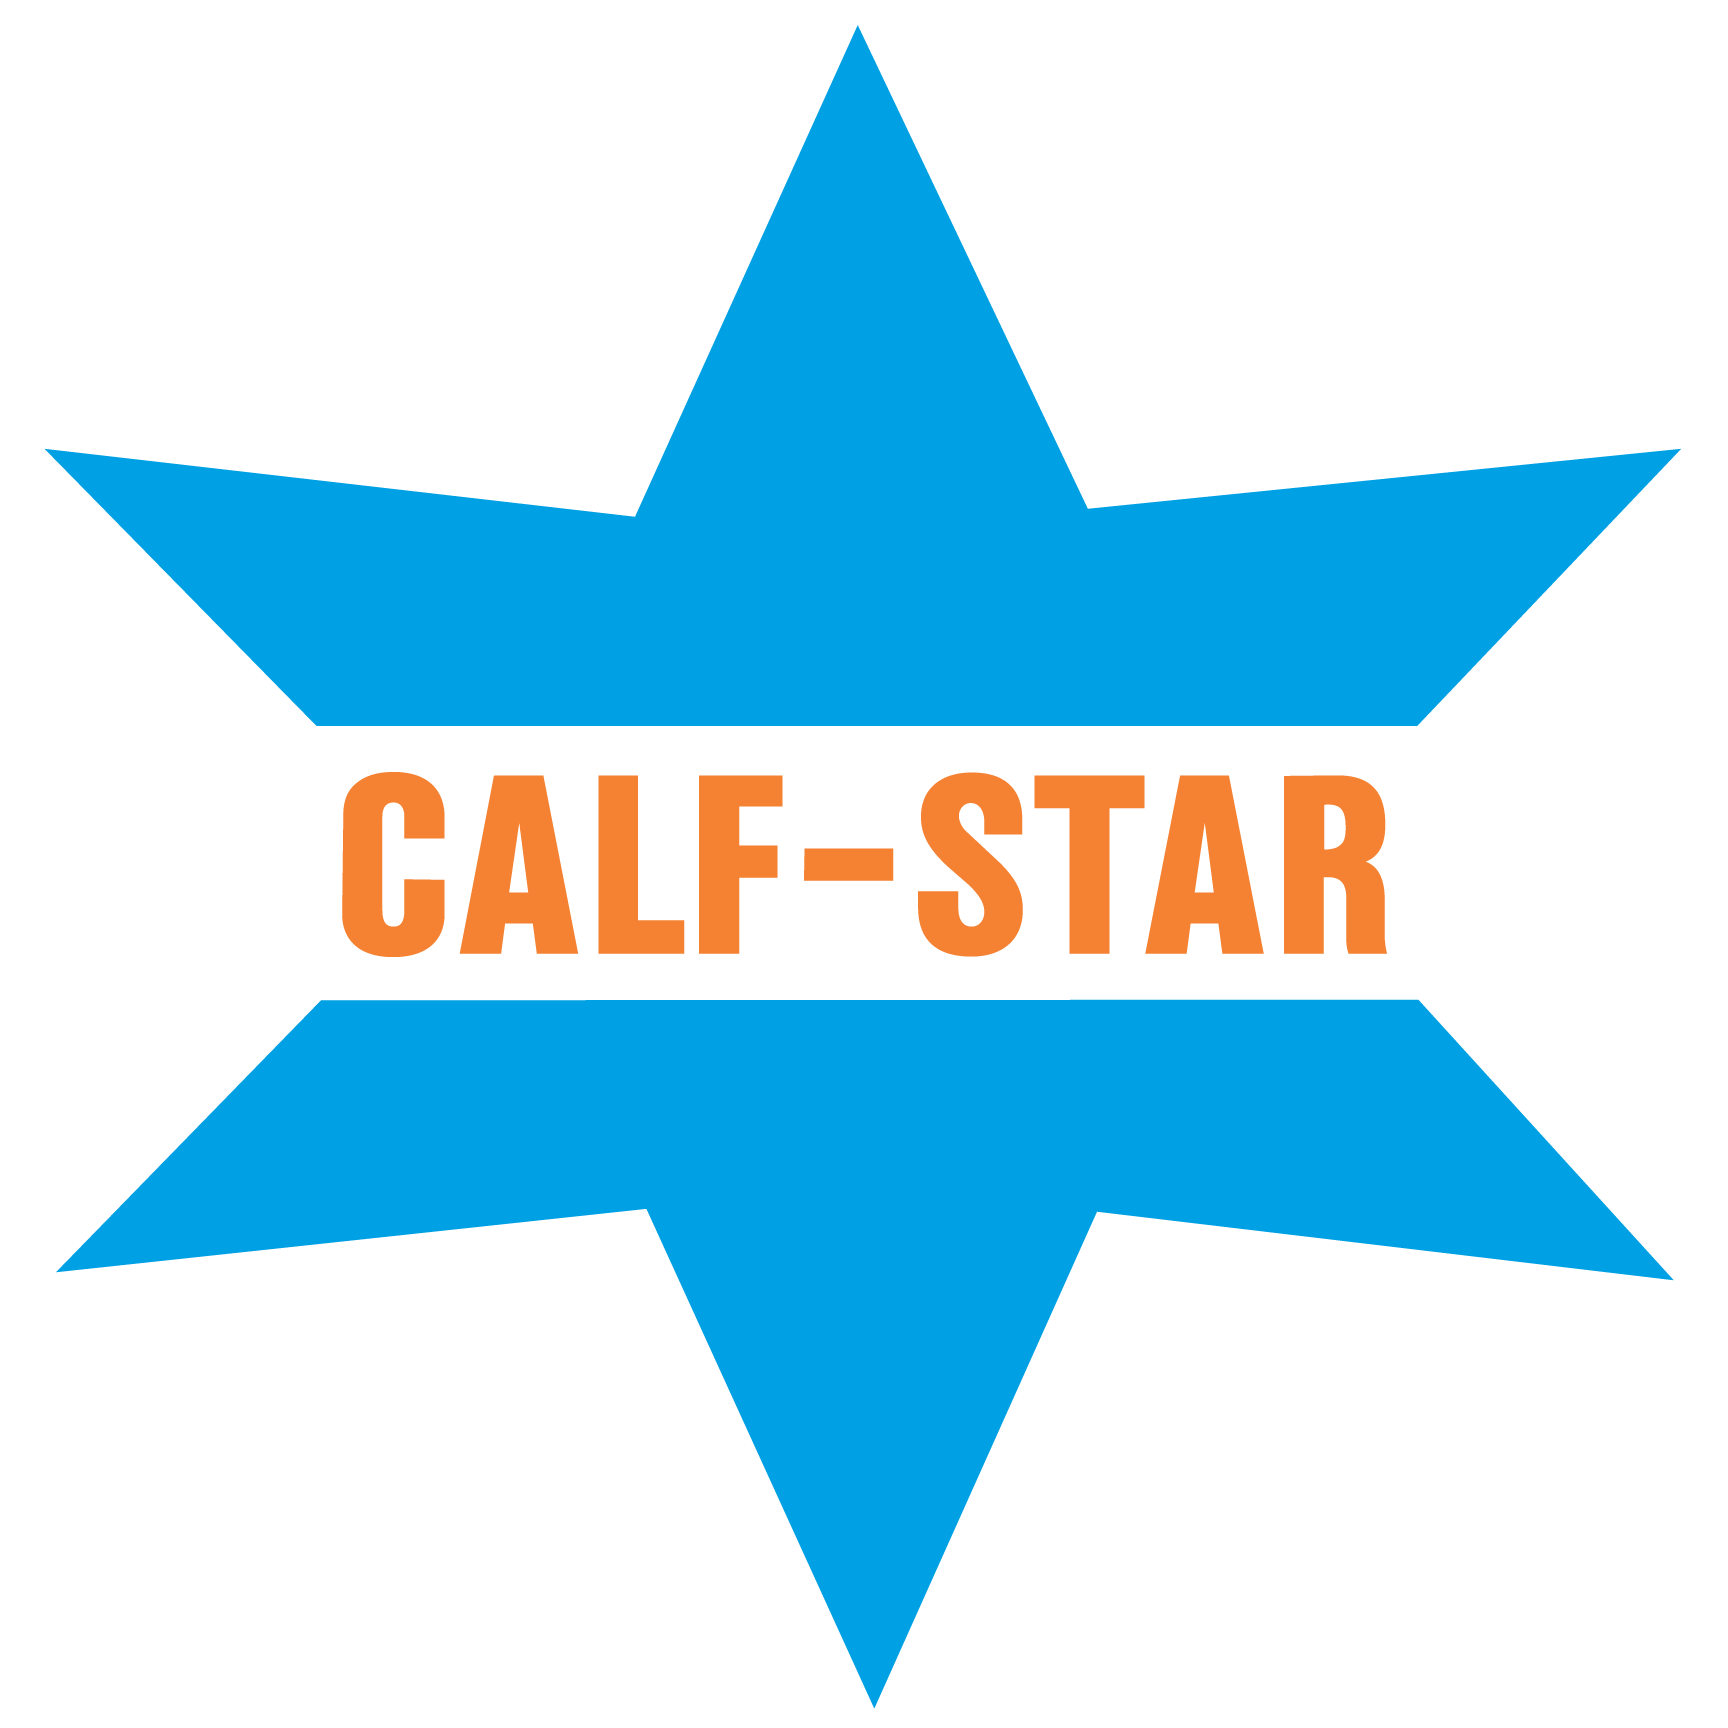 calf-STAR